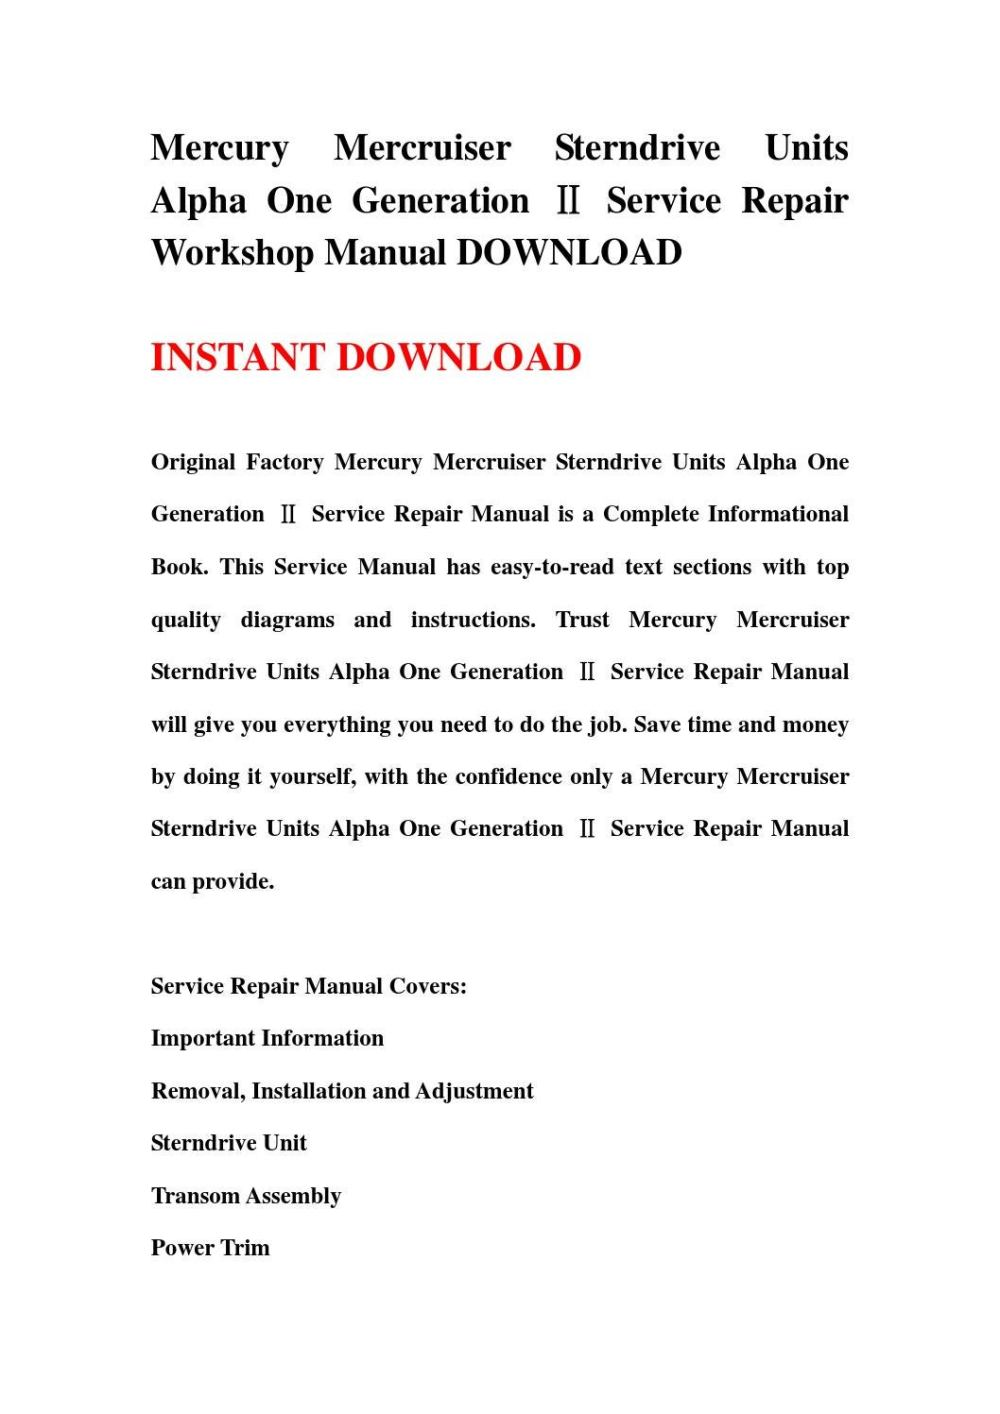 medium resolution of mercury mercruiser sterndrive units alpha one generation service repair workshop manual download